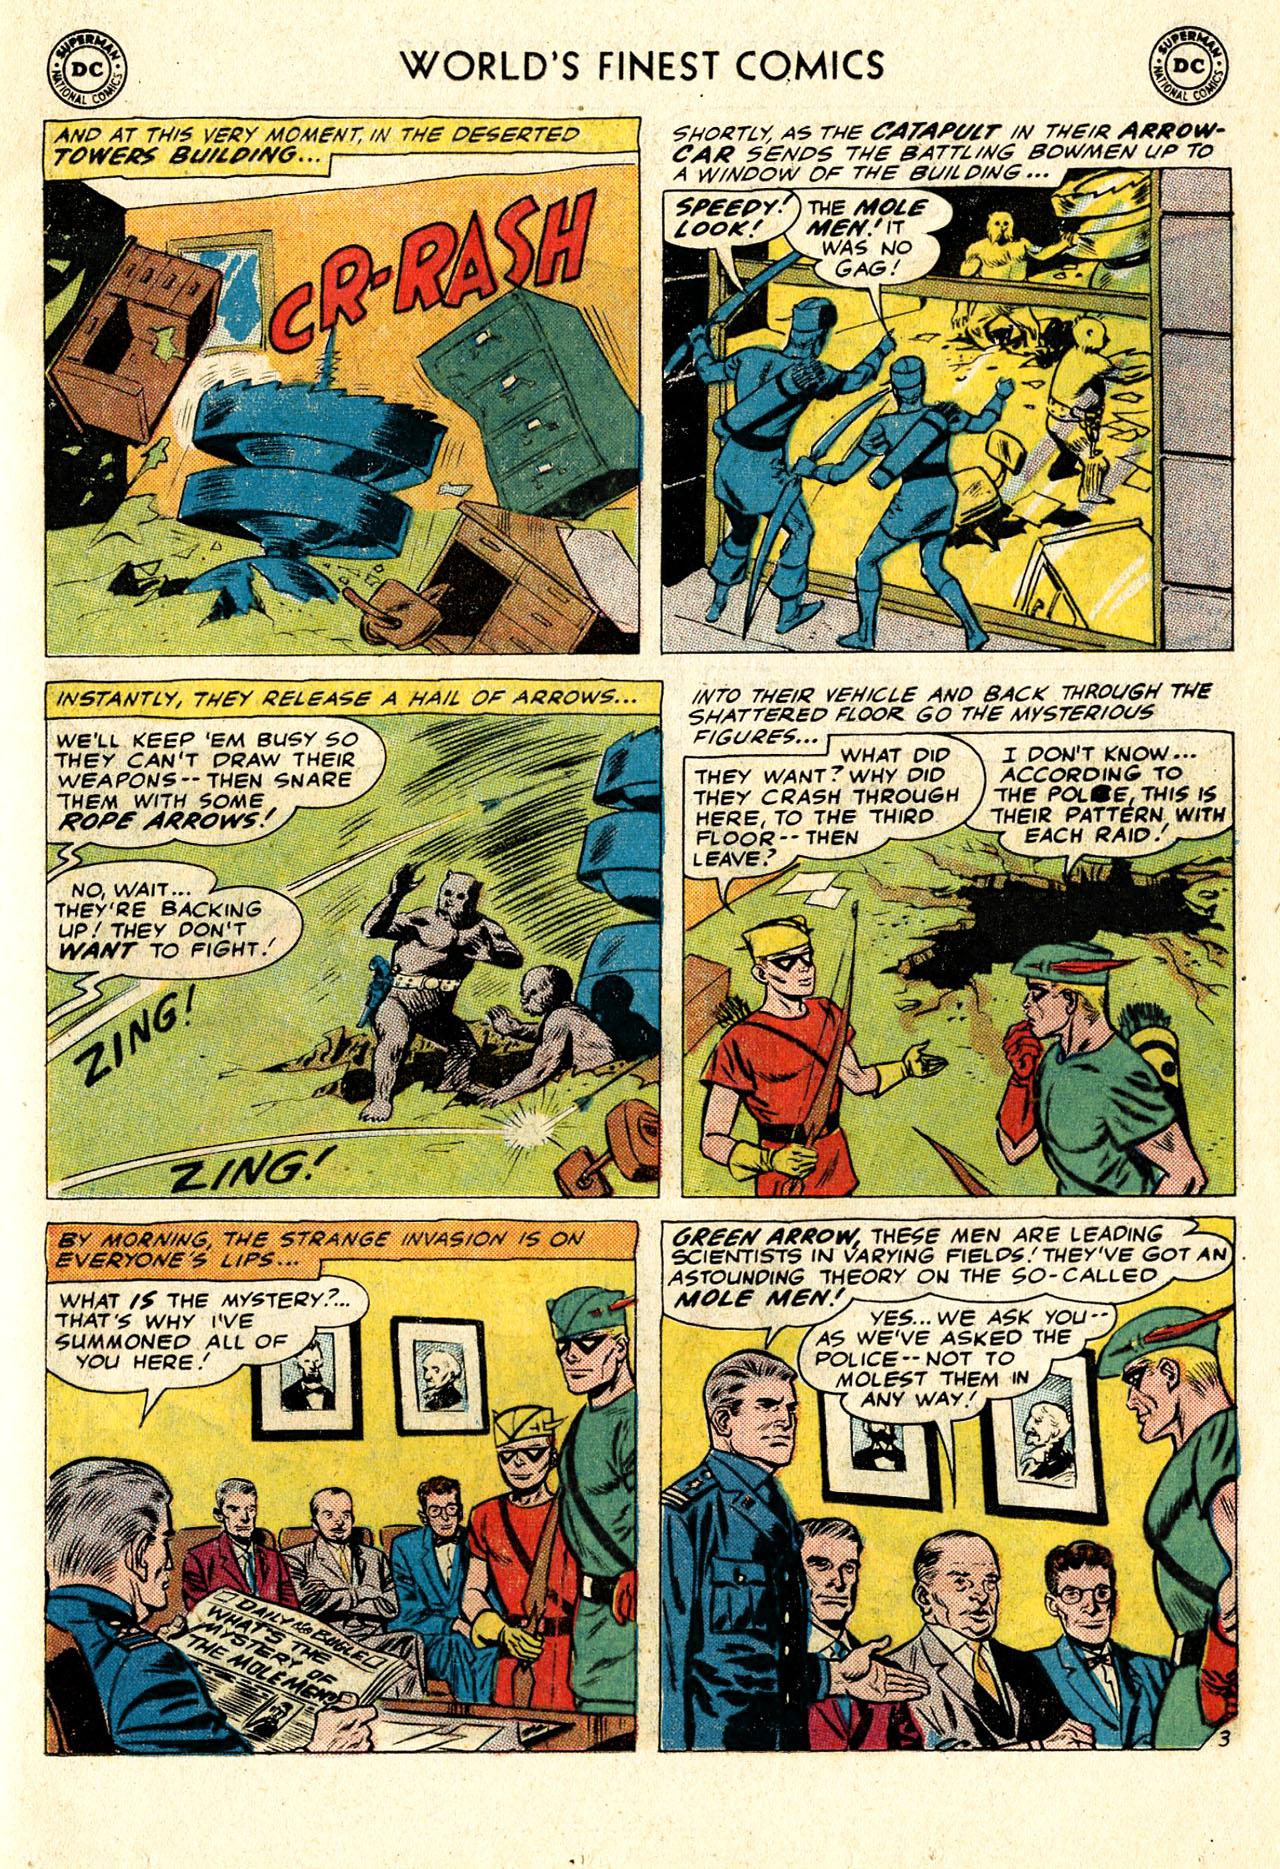 Read online World's Finest Comics comic -  Issue #107 - 29